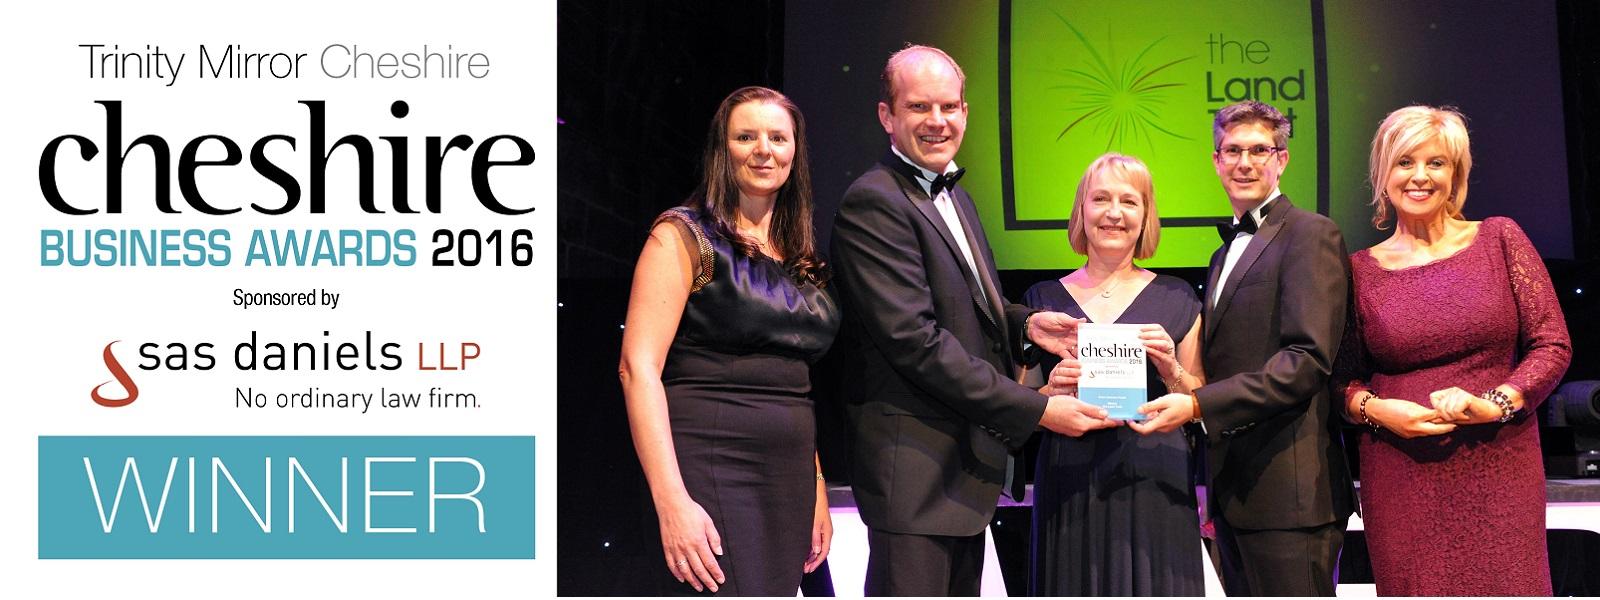 The Land Trust Green Business Award 2016